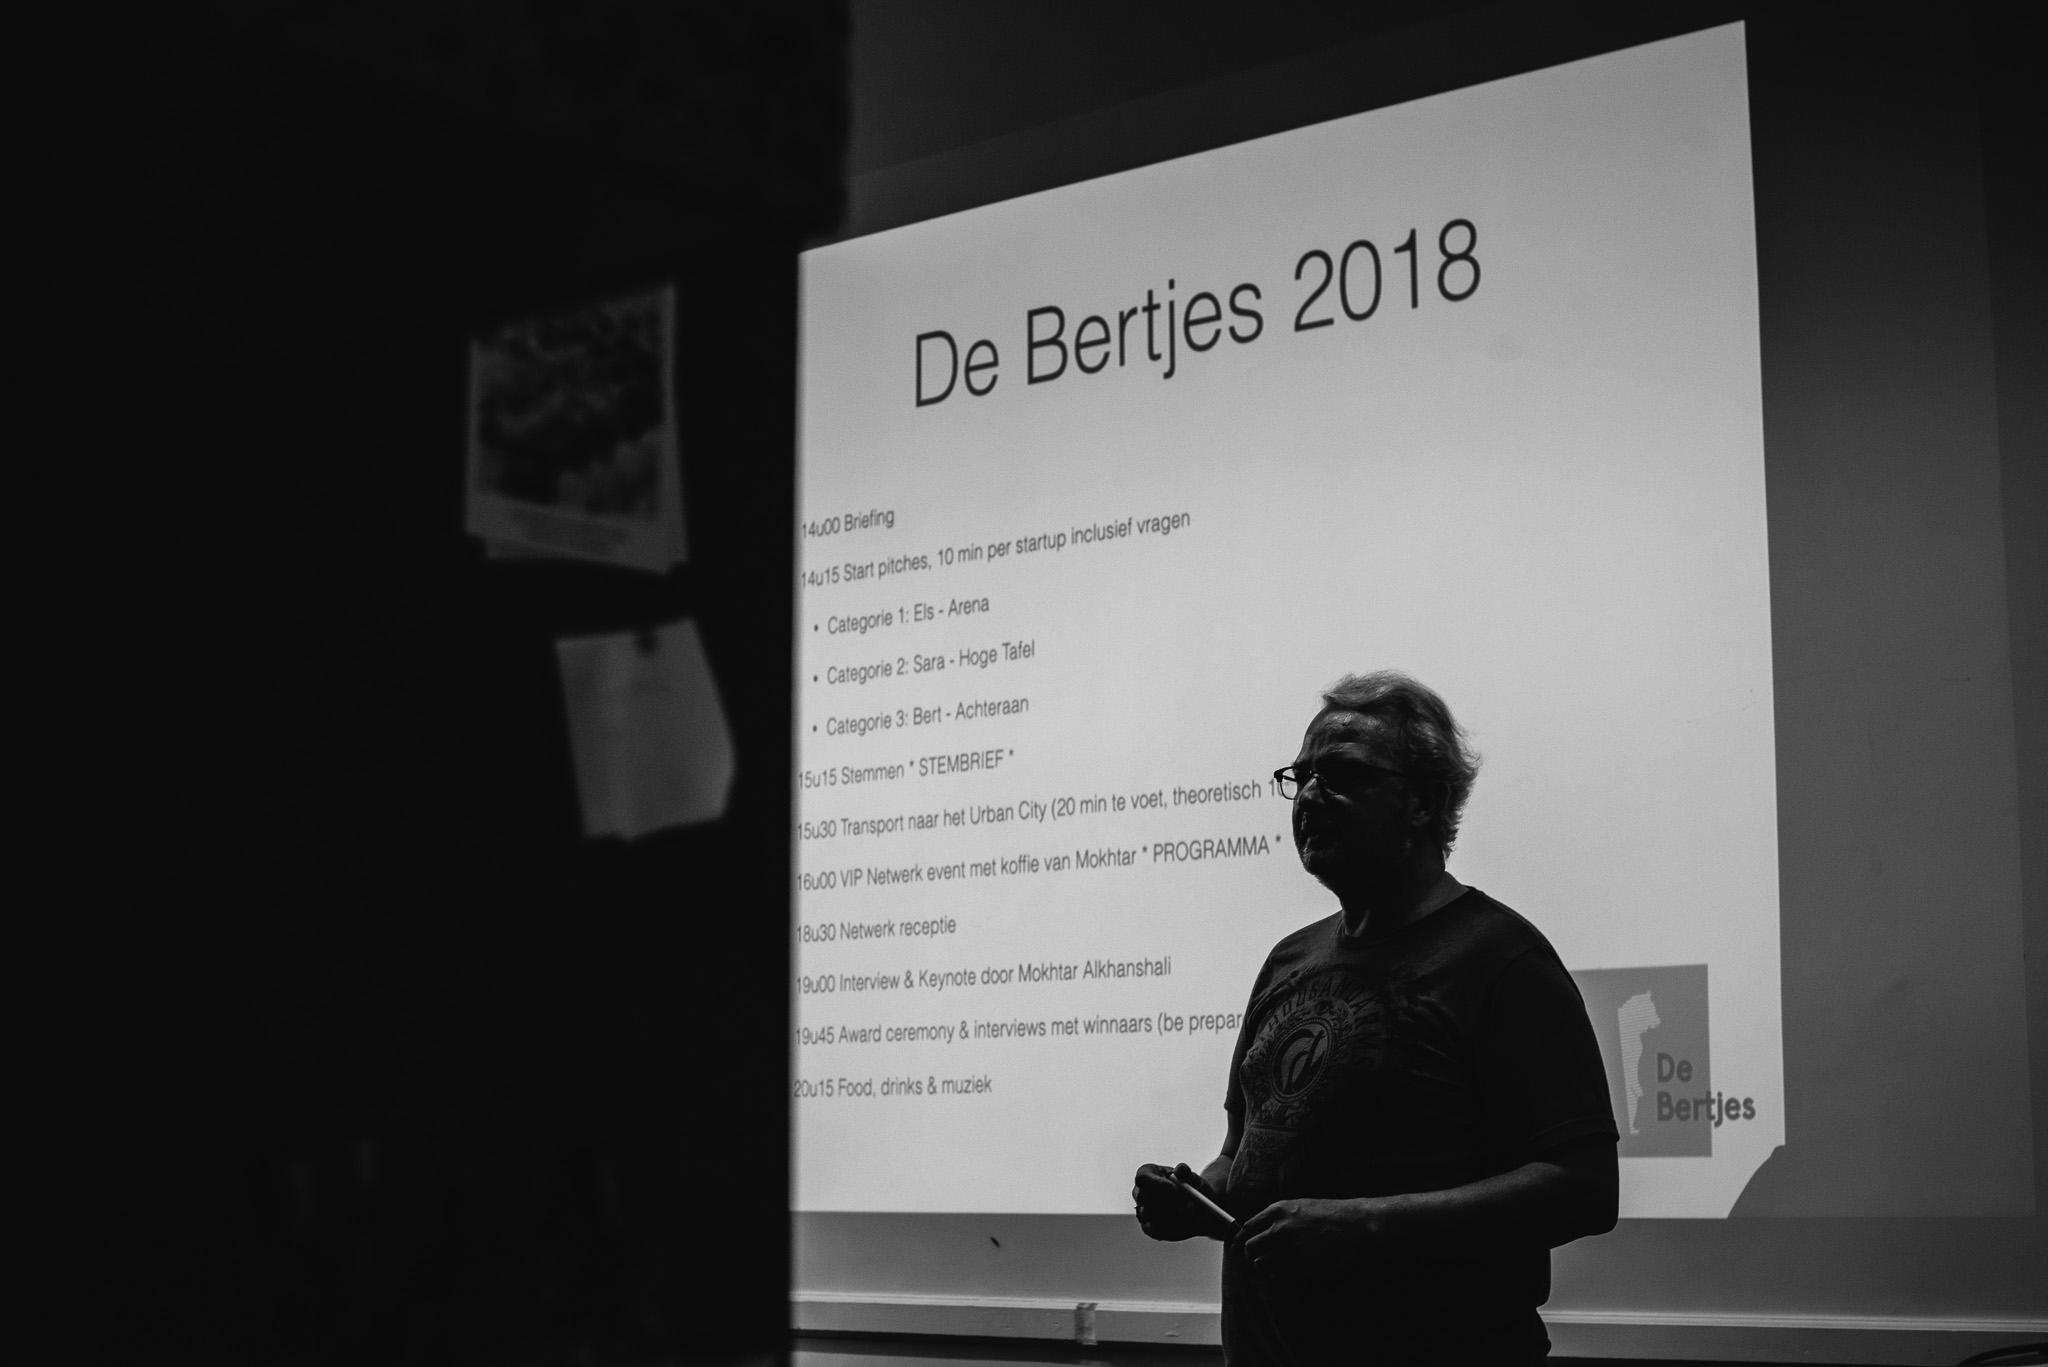 DeBertjes2018_Day-8.jpg